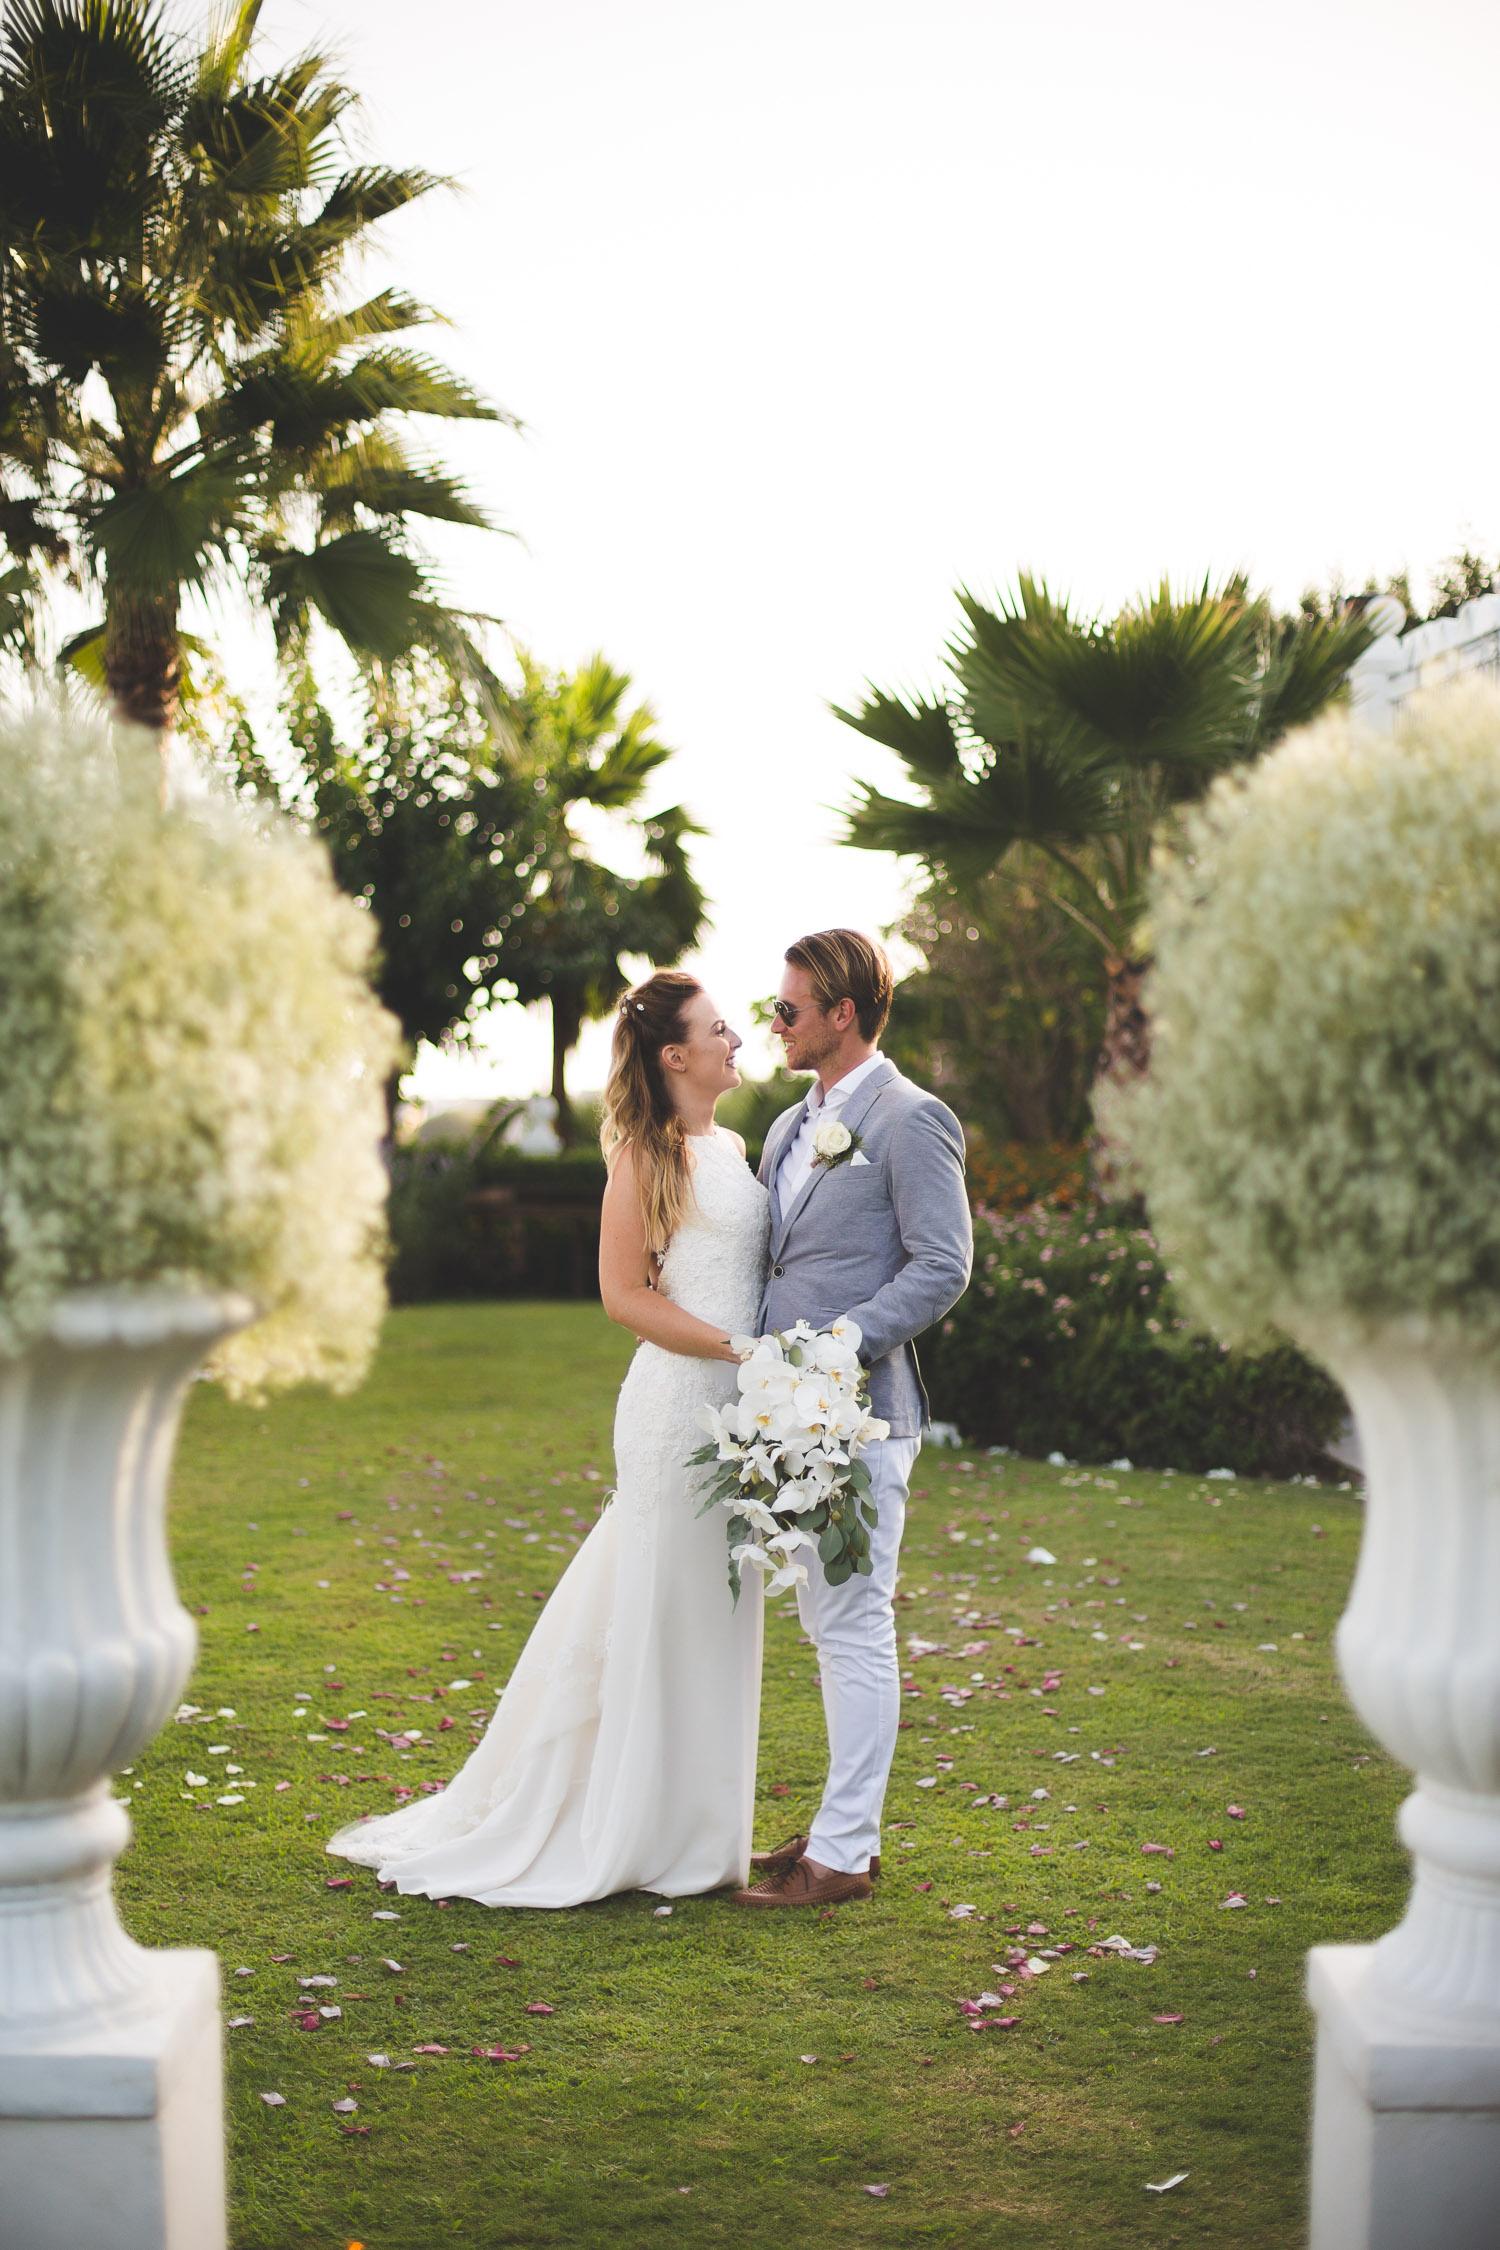 Surrey Wedding Photographer Kit Myers Paige Craig Spain121.jpg